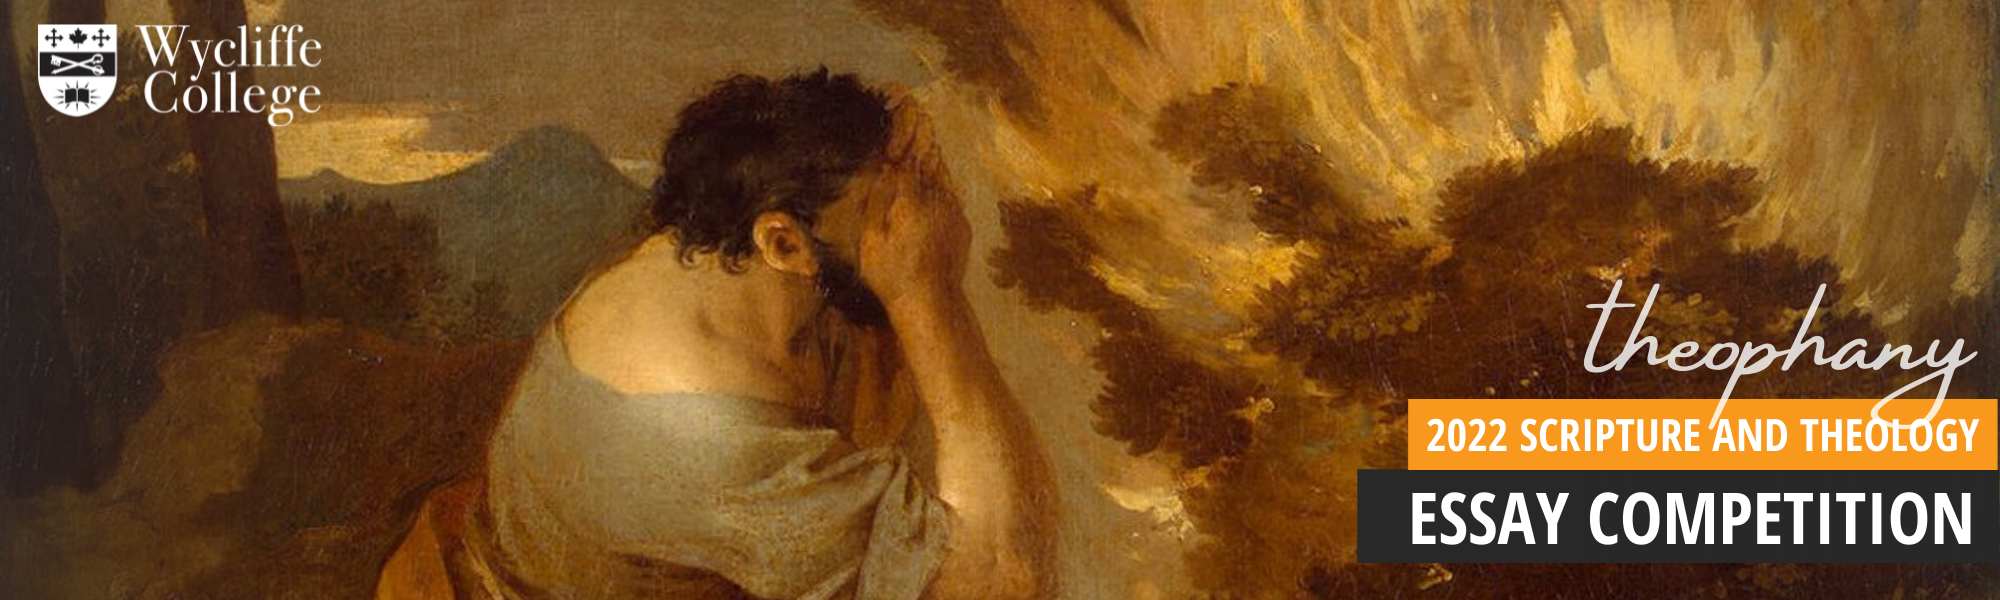 Burning Bush by Sébastien Bourdon, 17thC (Hermitage Museum, Saint Petersburg)